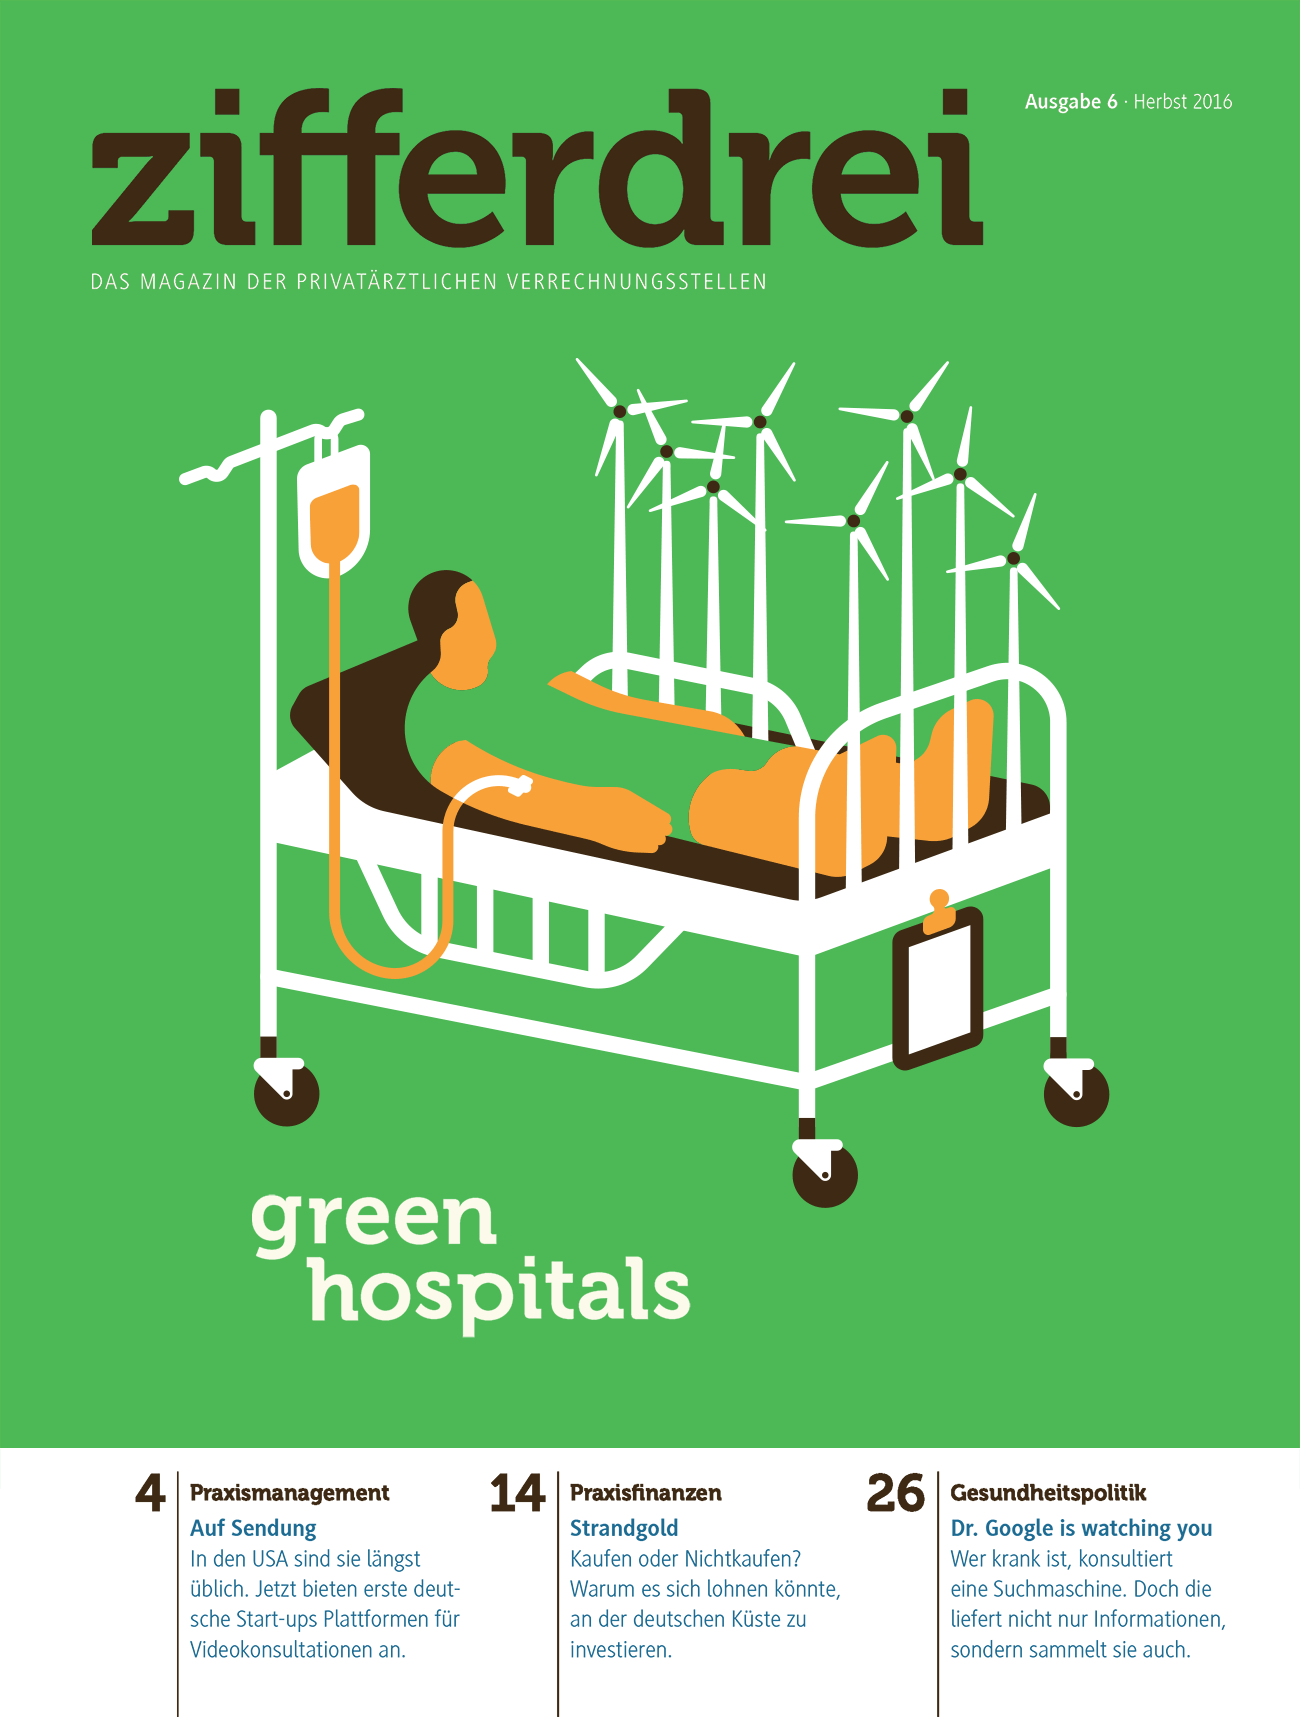 Green hospitals. Zifferdrei